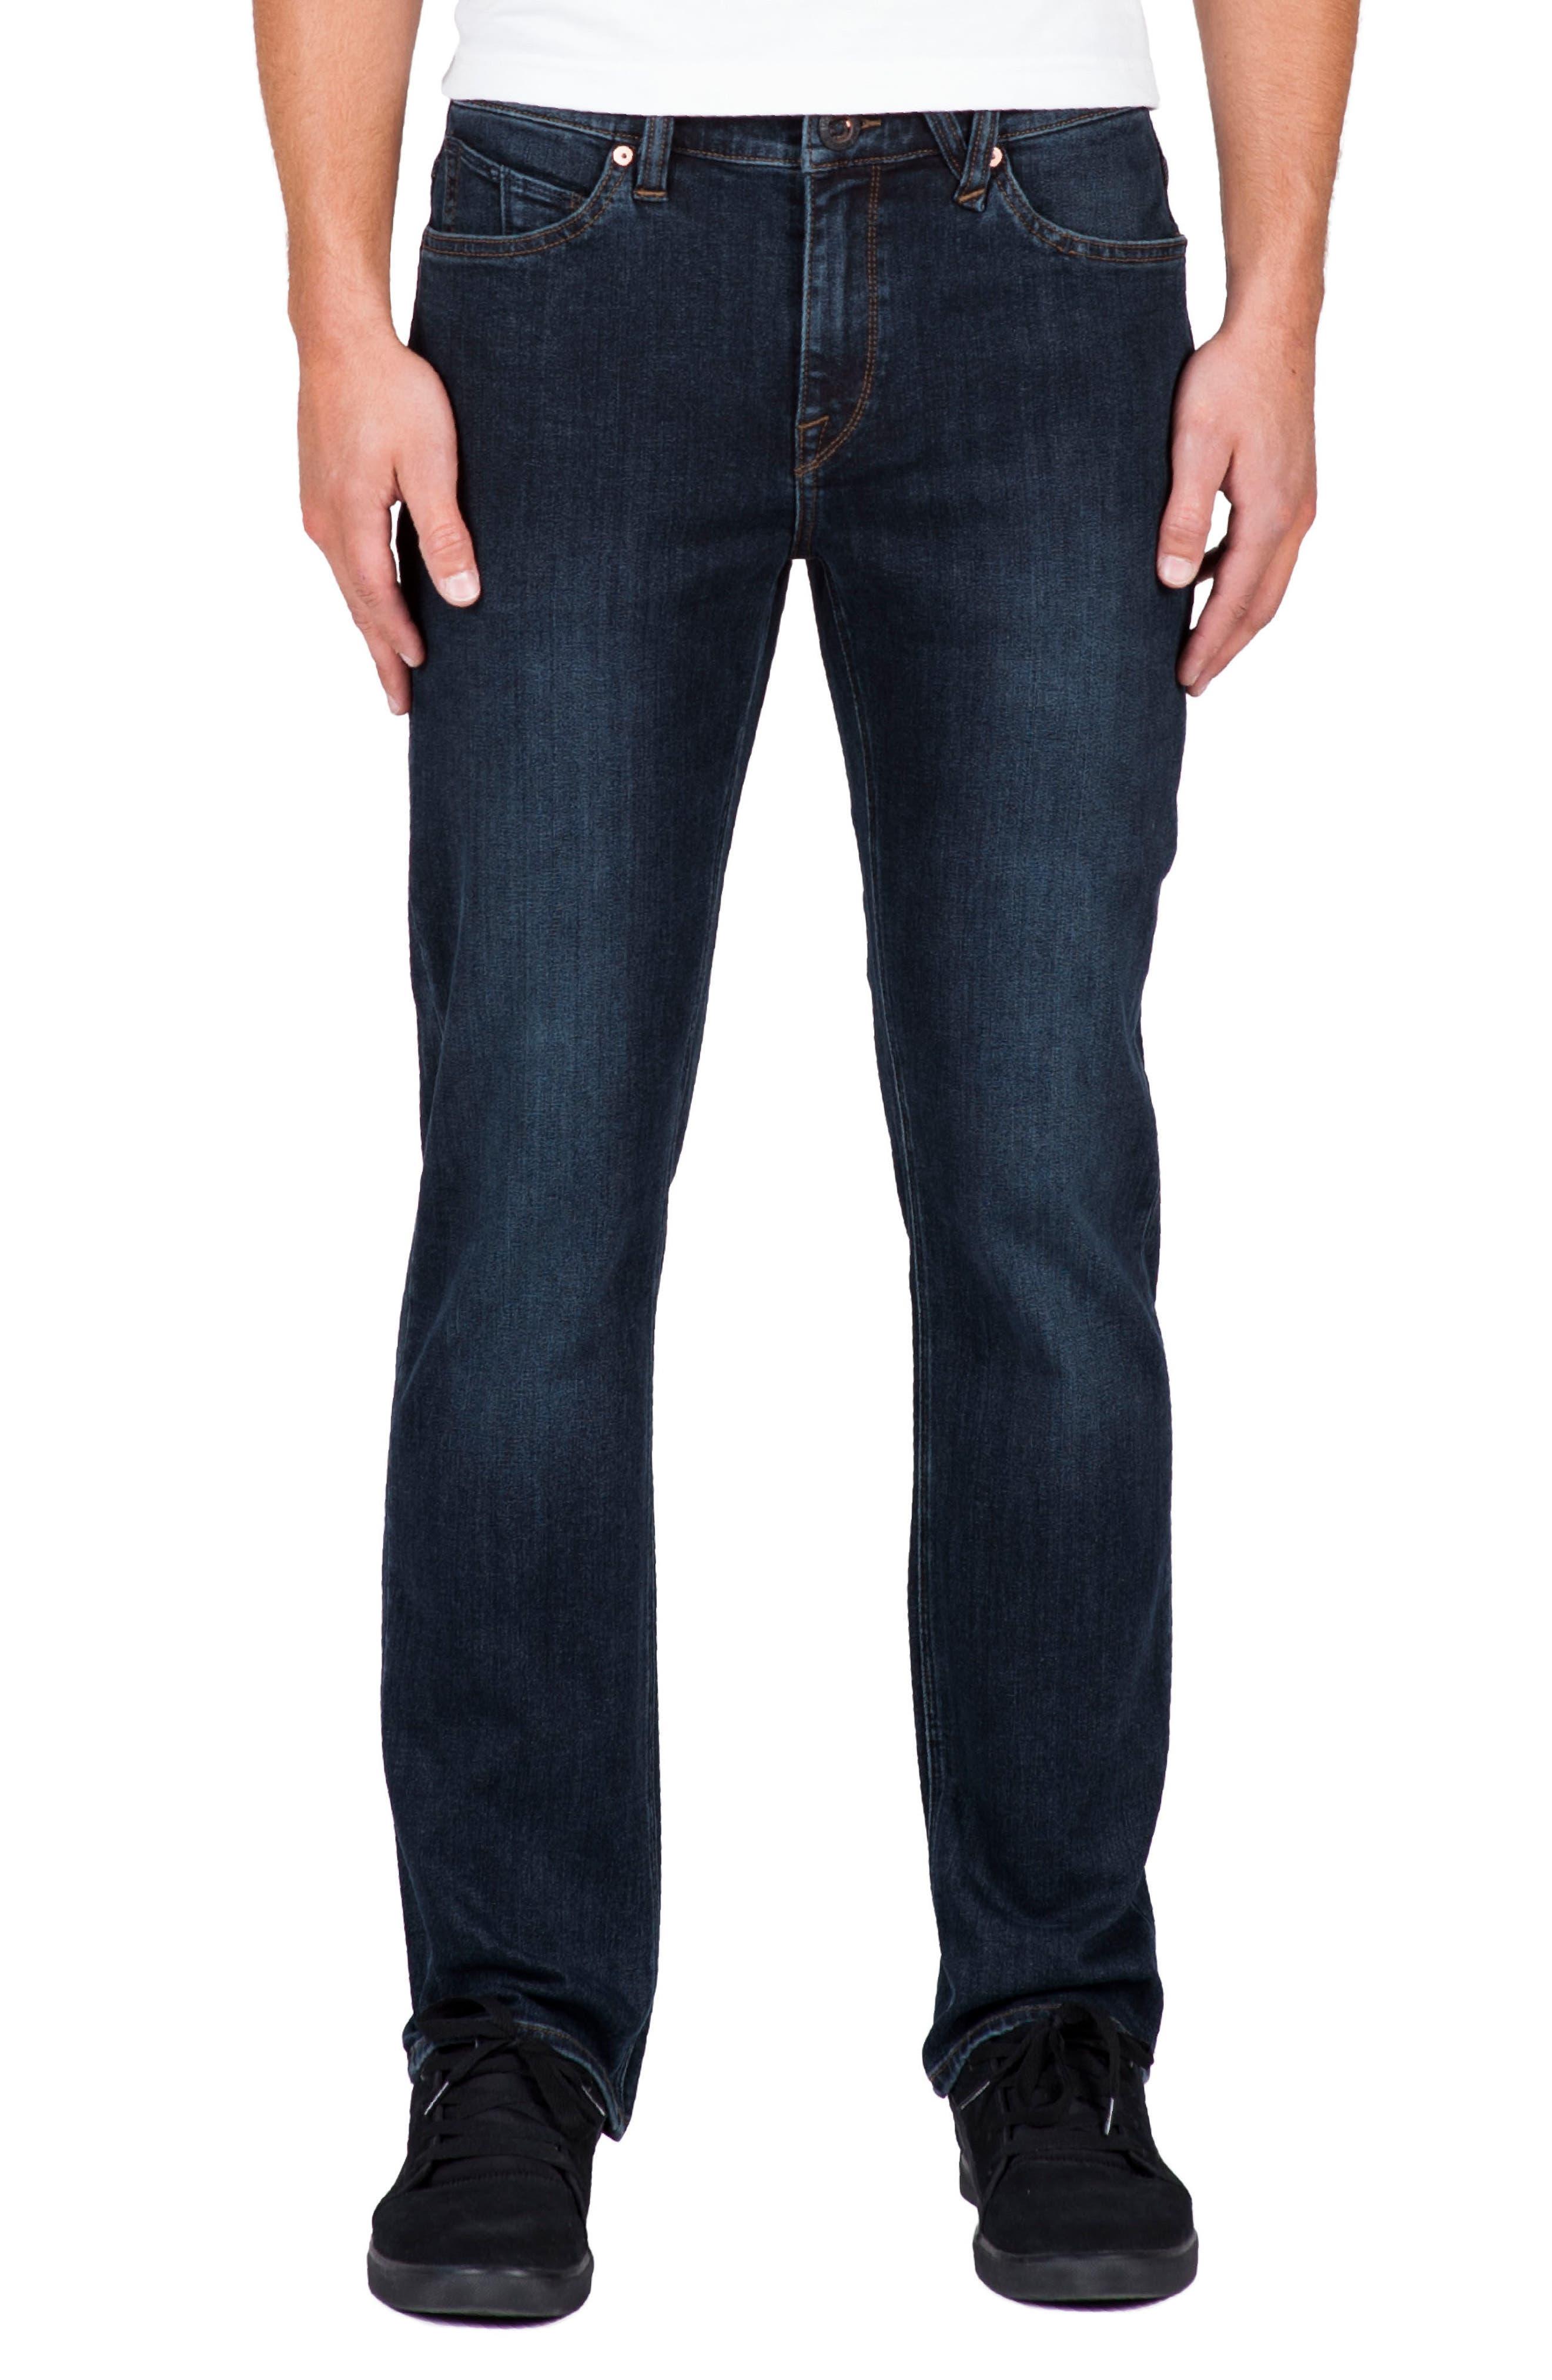 'Solver' Straight Leg Jeans,                         Main,                         color, Blue Vnt